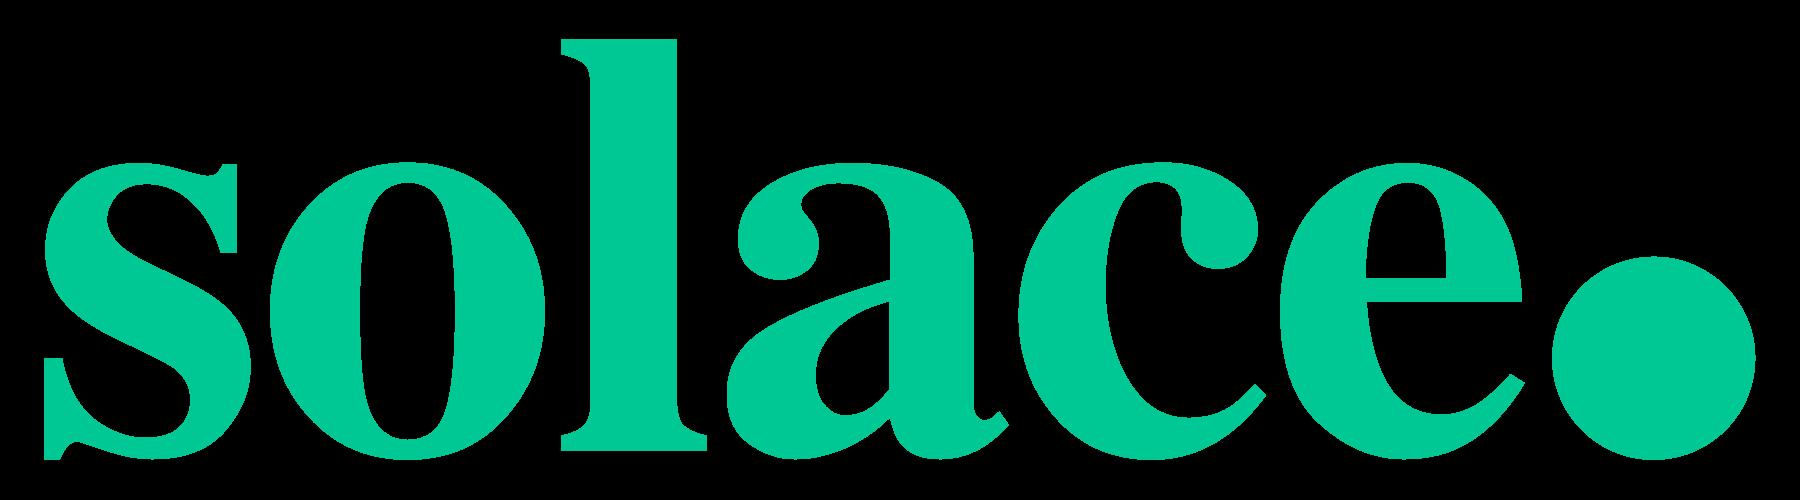 Solace_Logo_Green_V2 (1).png